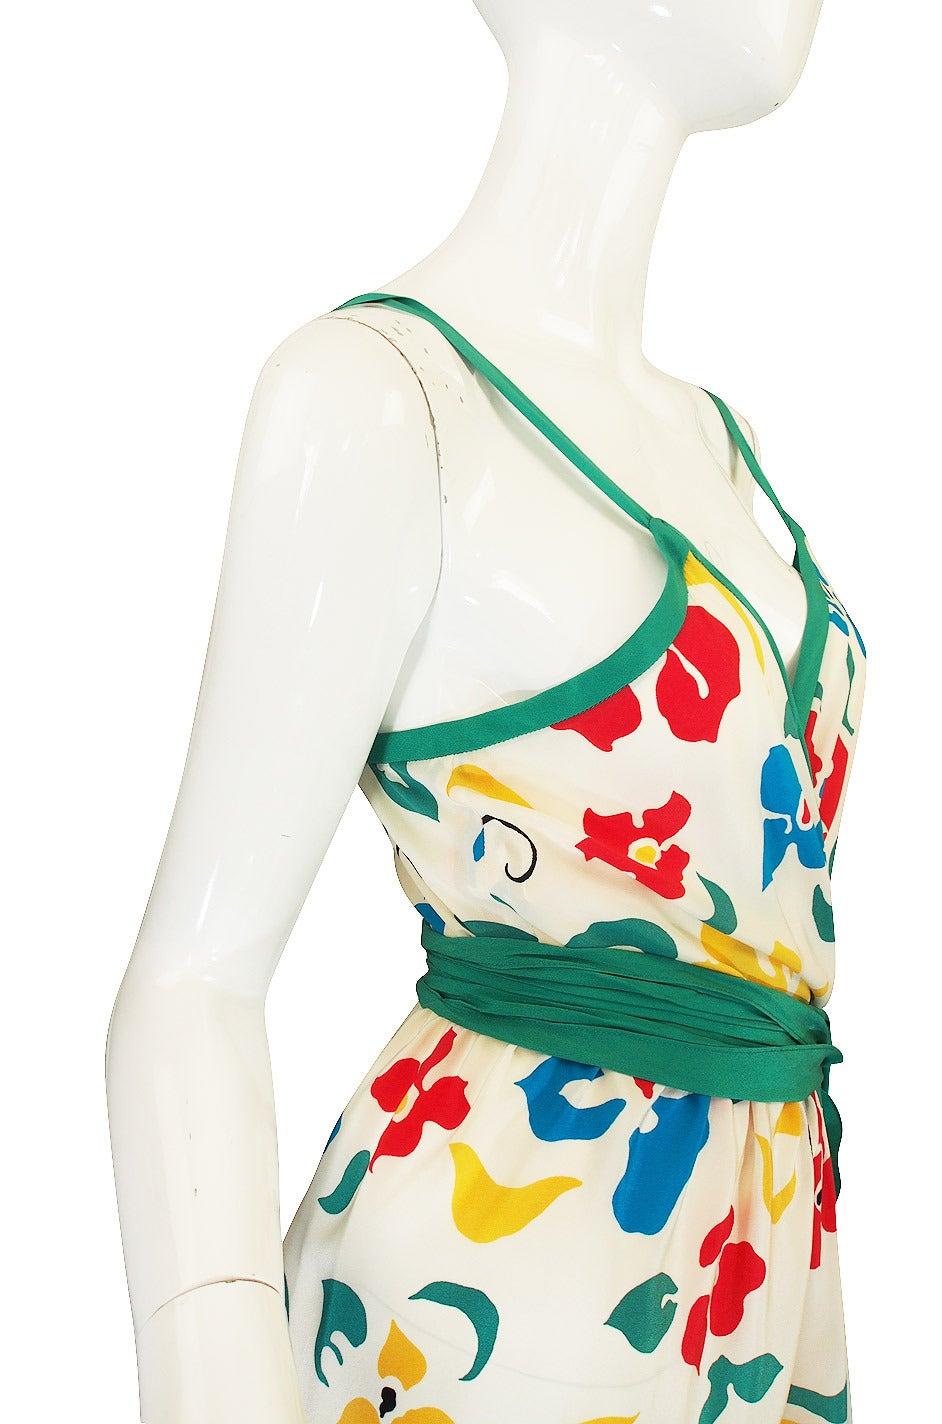 1979 Oscar De La Renta Dress as Seen in Vogue 5